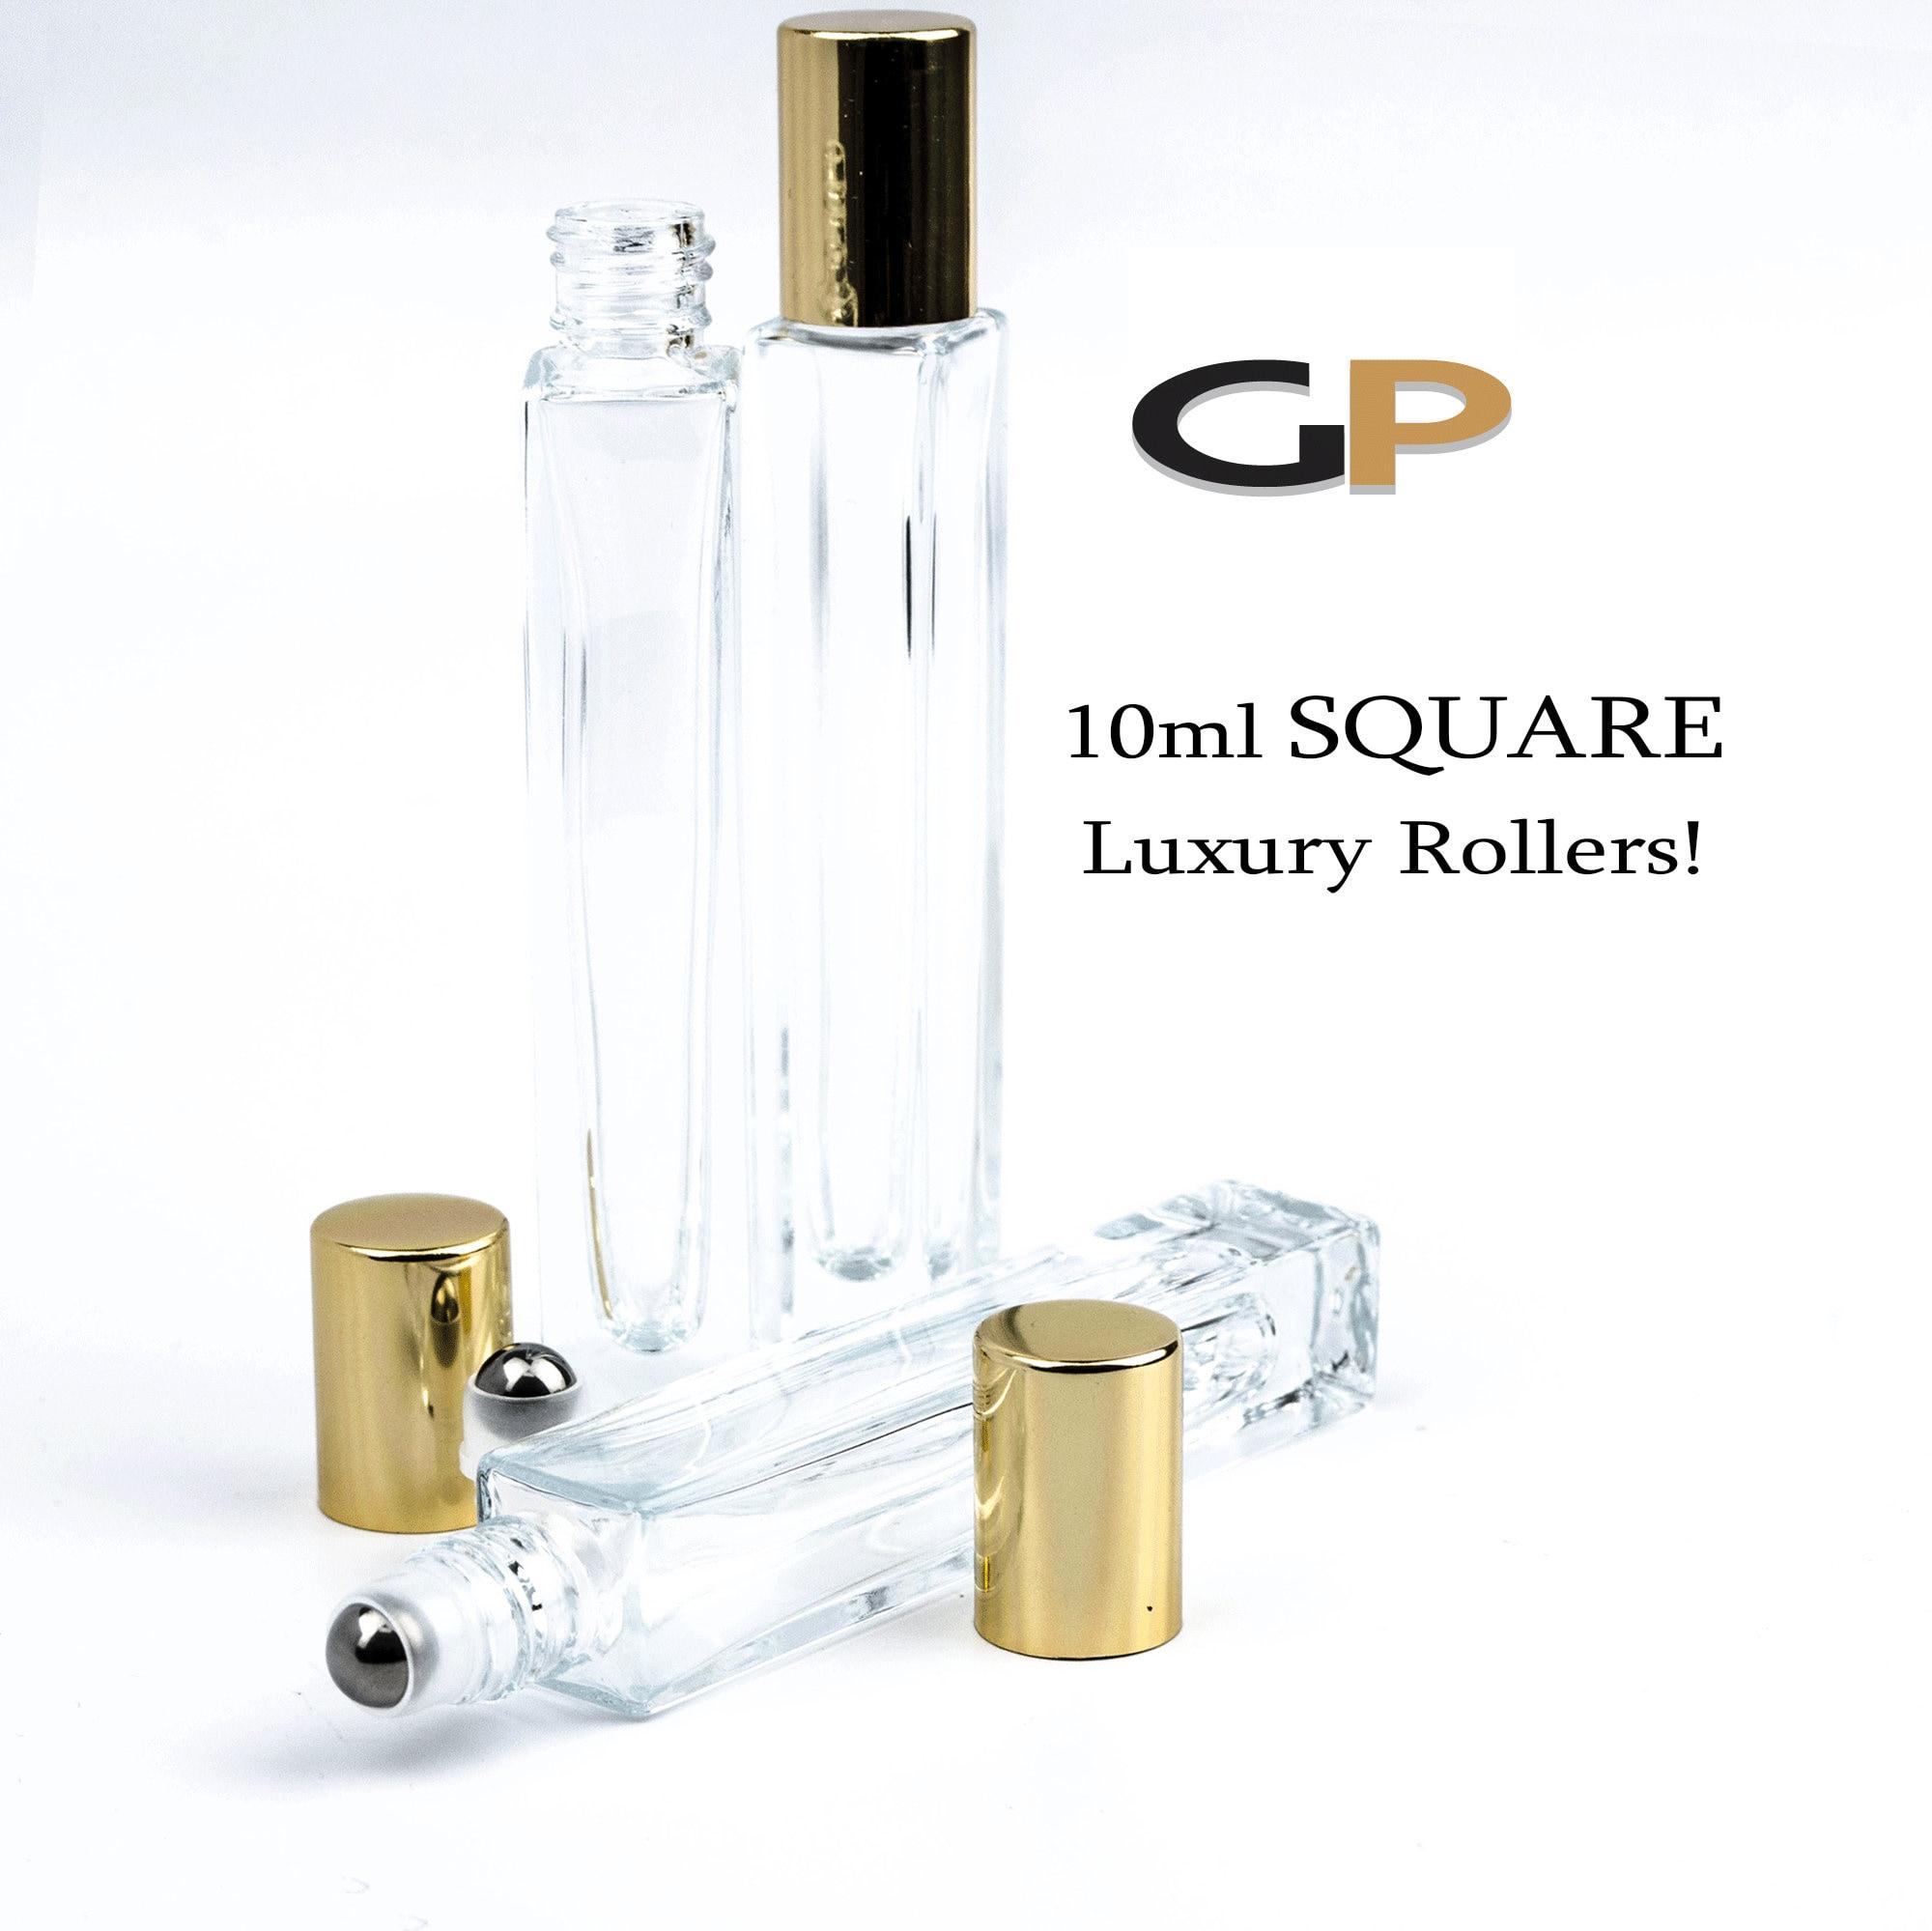 2fc0a12c2e43 PREMIUM 10 ml Square Essential Oil Roller Bottle | Perfume Bottle ...